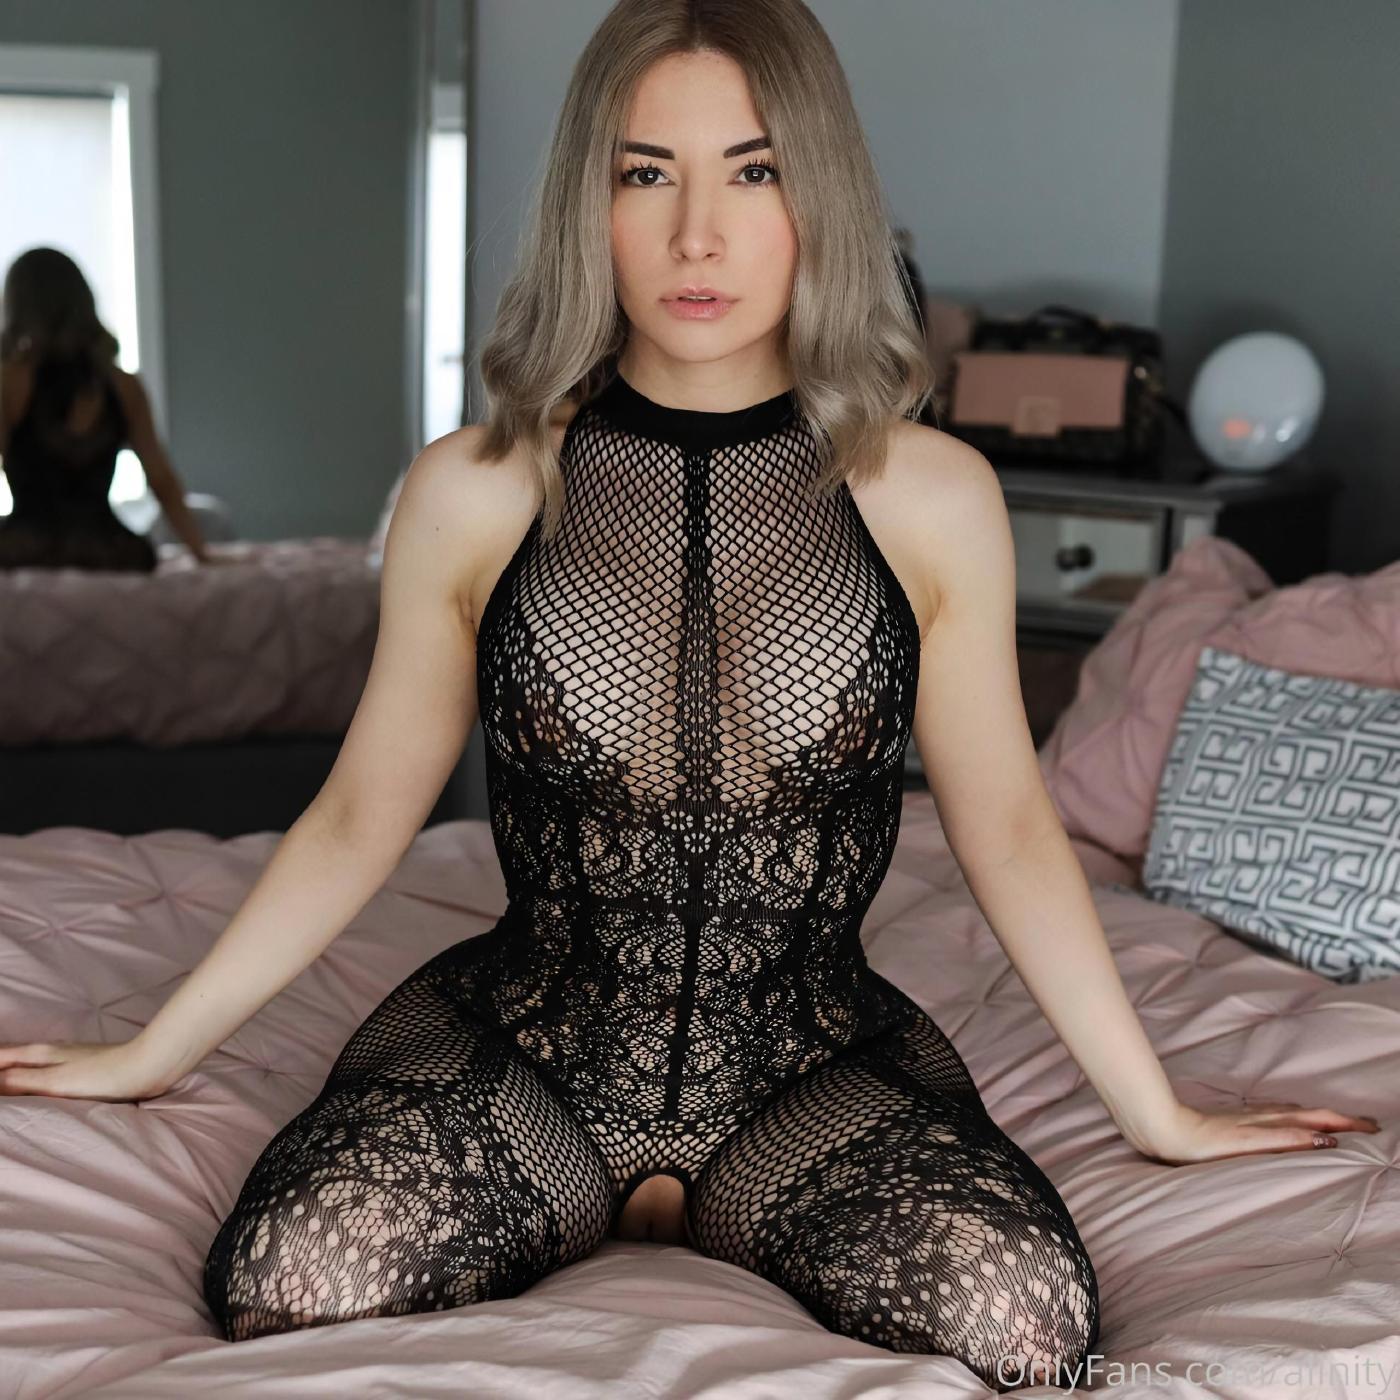 Alinity Pussy Slip Onlyfans Set Leaked 0002